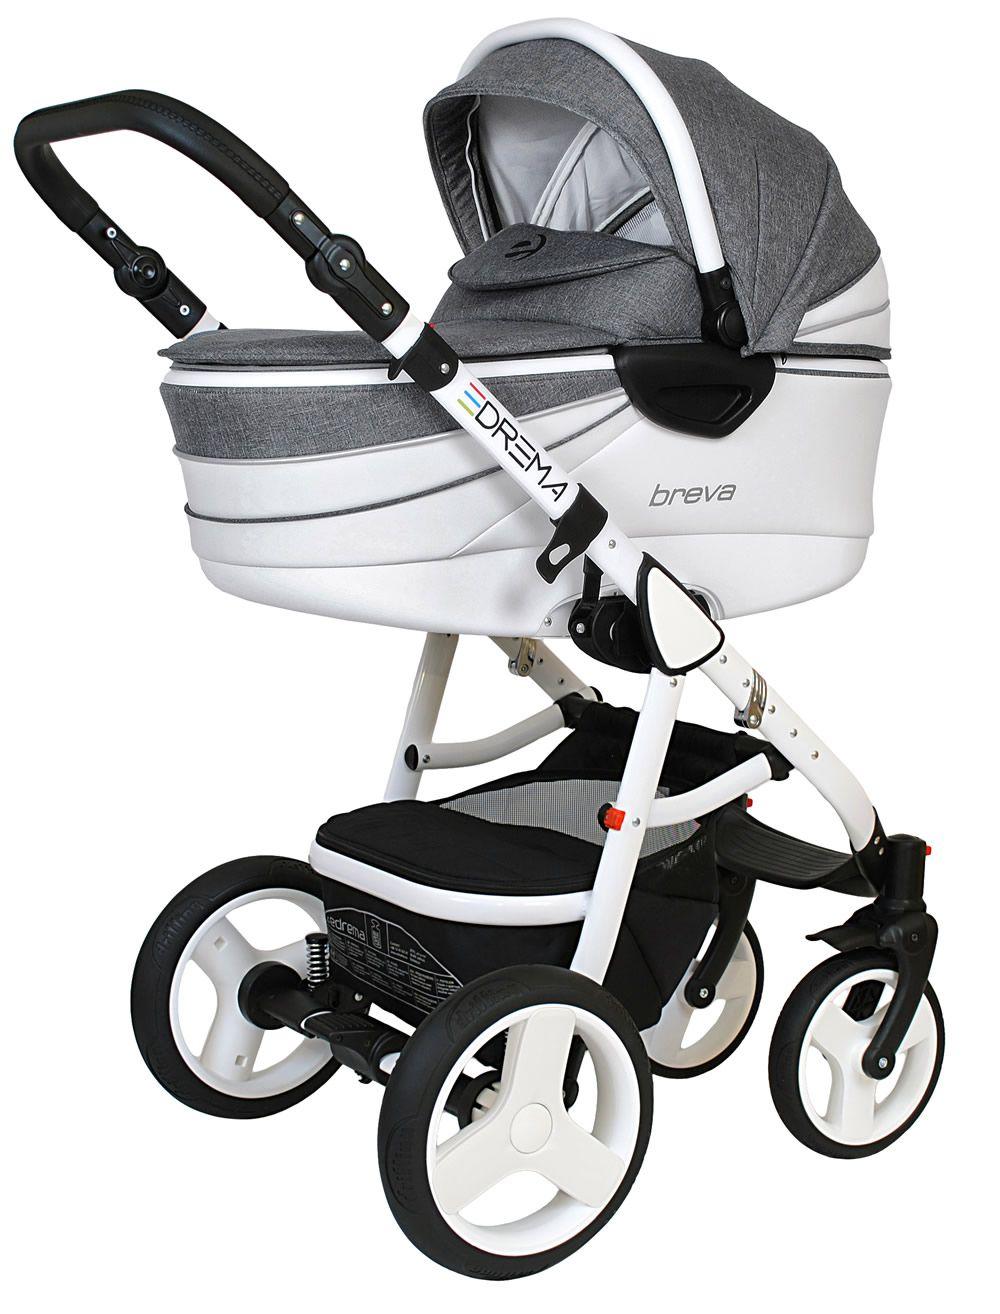 Breva Premium Kombi Kinderwagen 3 In 1 Mit Babyschale Bp1 Breva Prem 2 Kinderwagen Kinder Wagen Kinderwagen 2 In 1